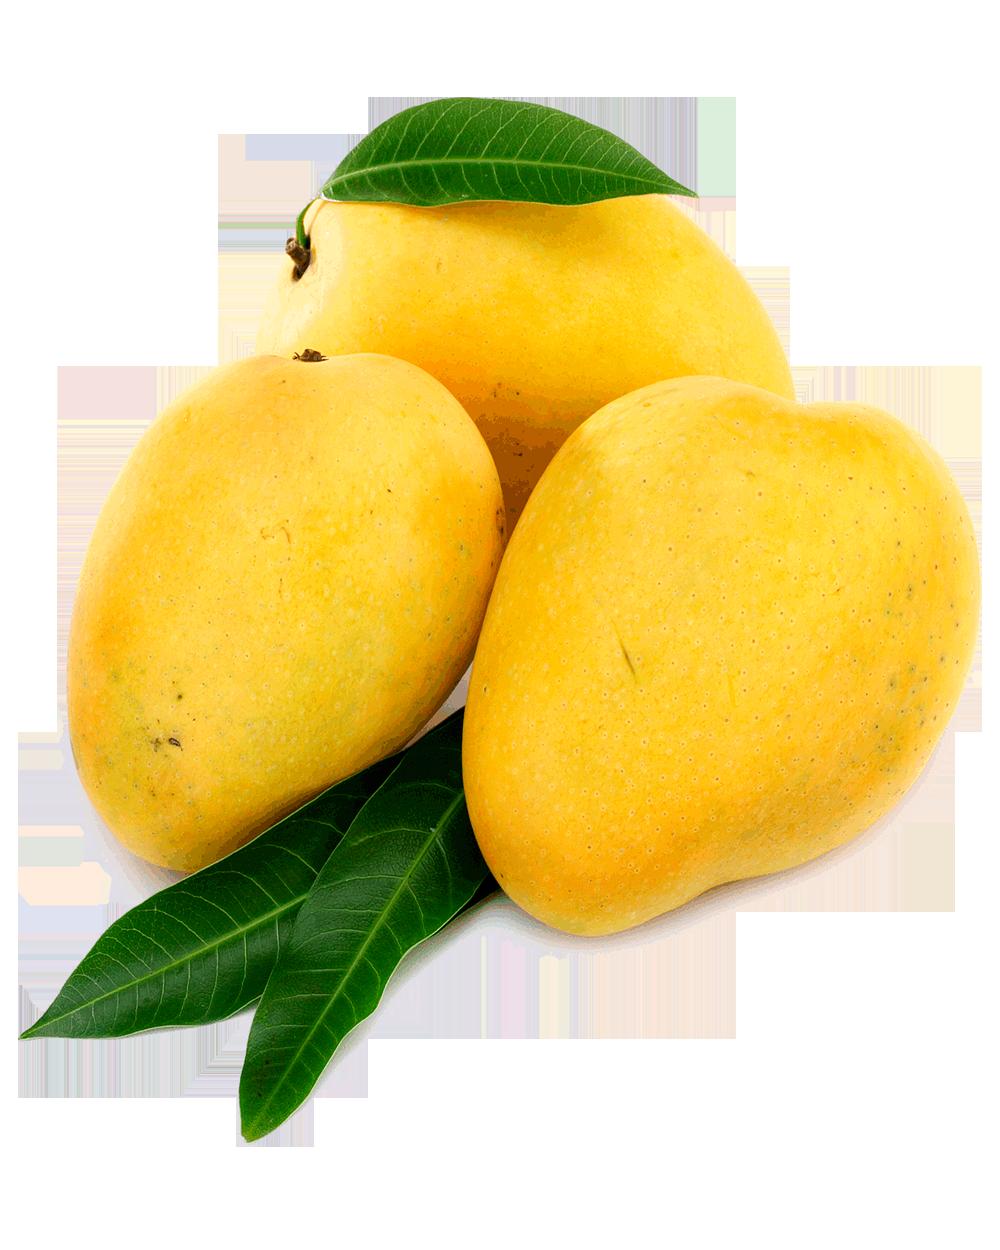 Mango PNG Images Transparent Free Download.